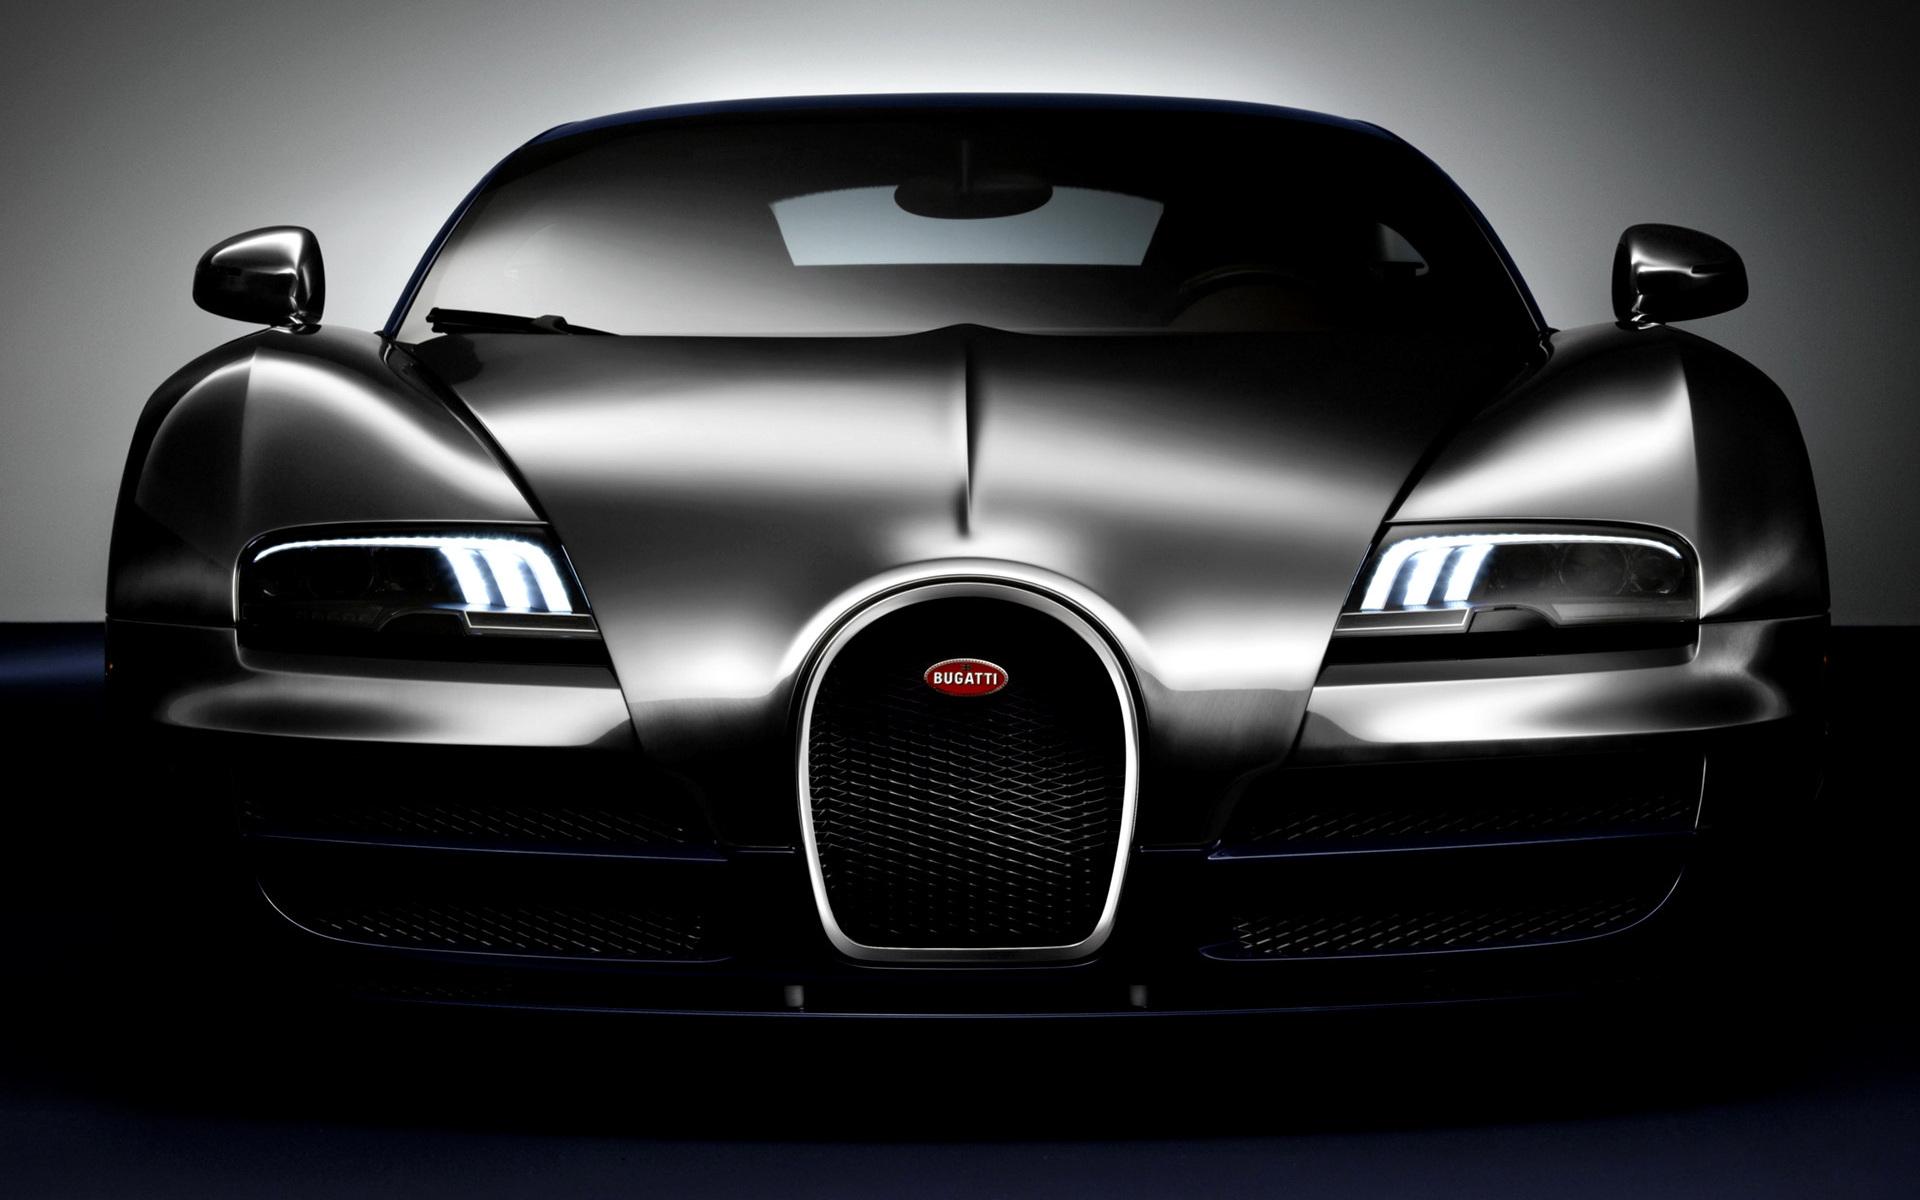 bugatti-veyron-grand-sport-vitesse-ettore-bugatti-car-wallpaper-10809 Astounding Bugatti Veyron Grand Sport Vitesse Hd Cars Trend